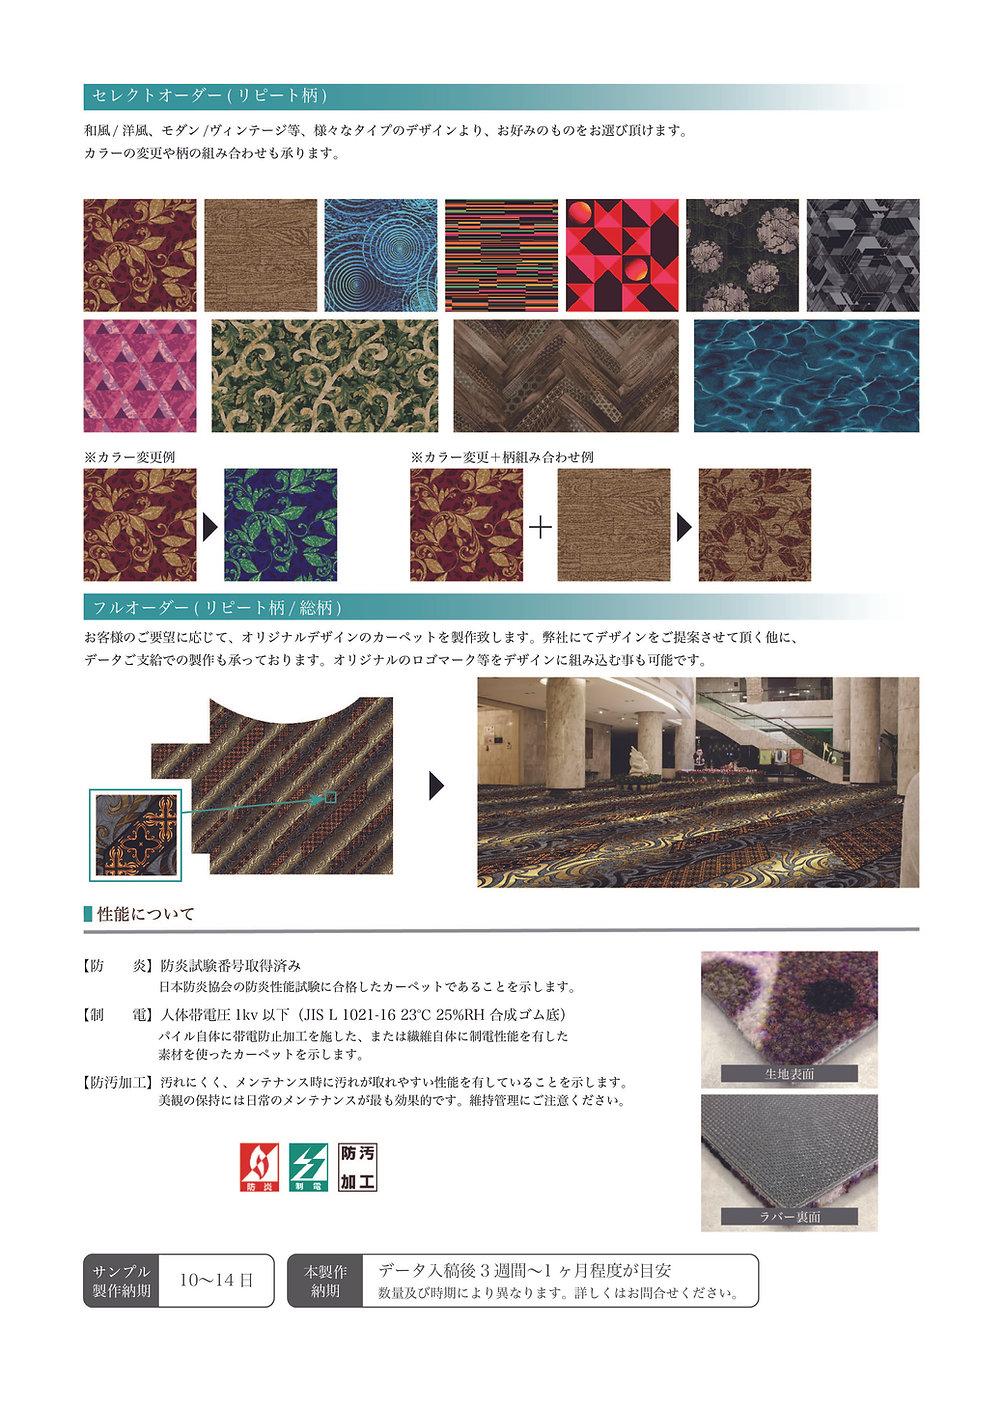 200817_G-Graphy会社案内Newサイト用-05.jpg